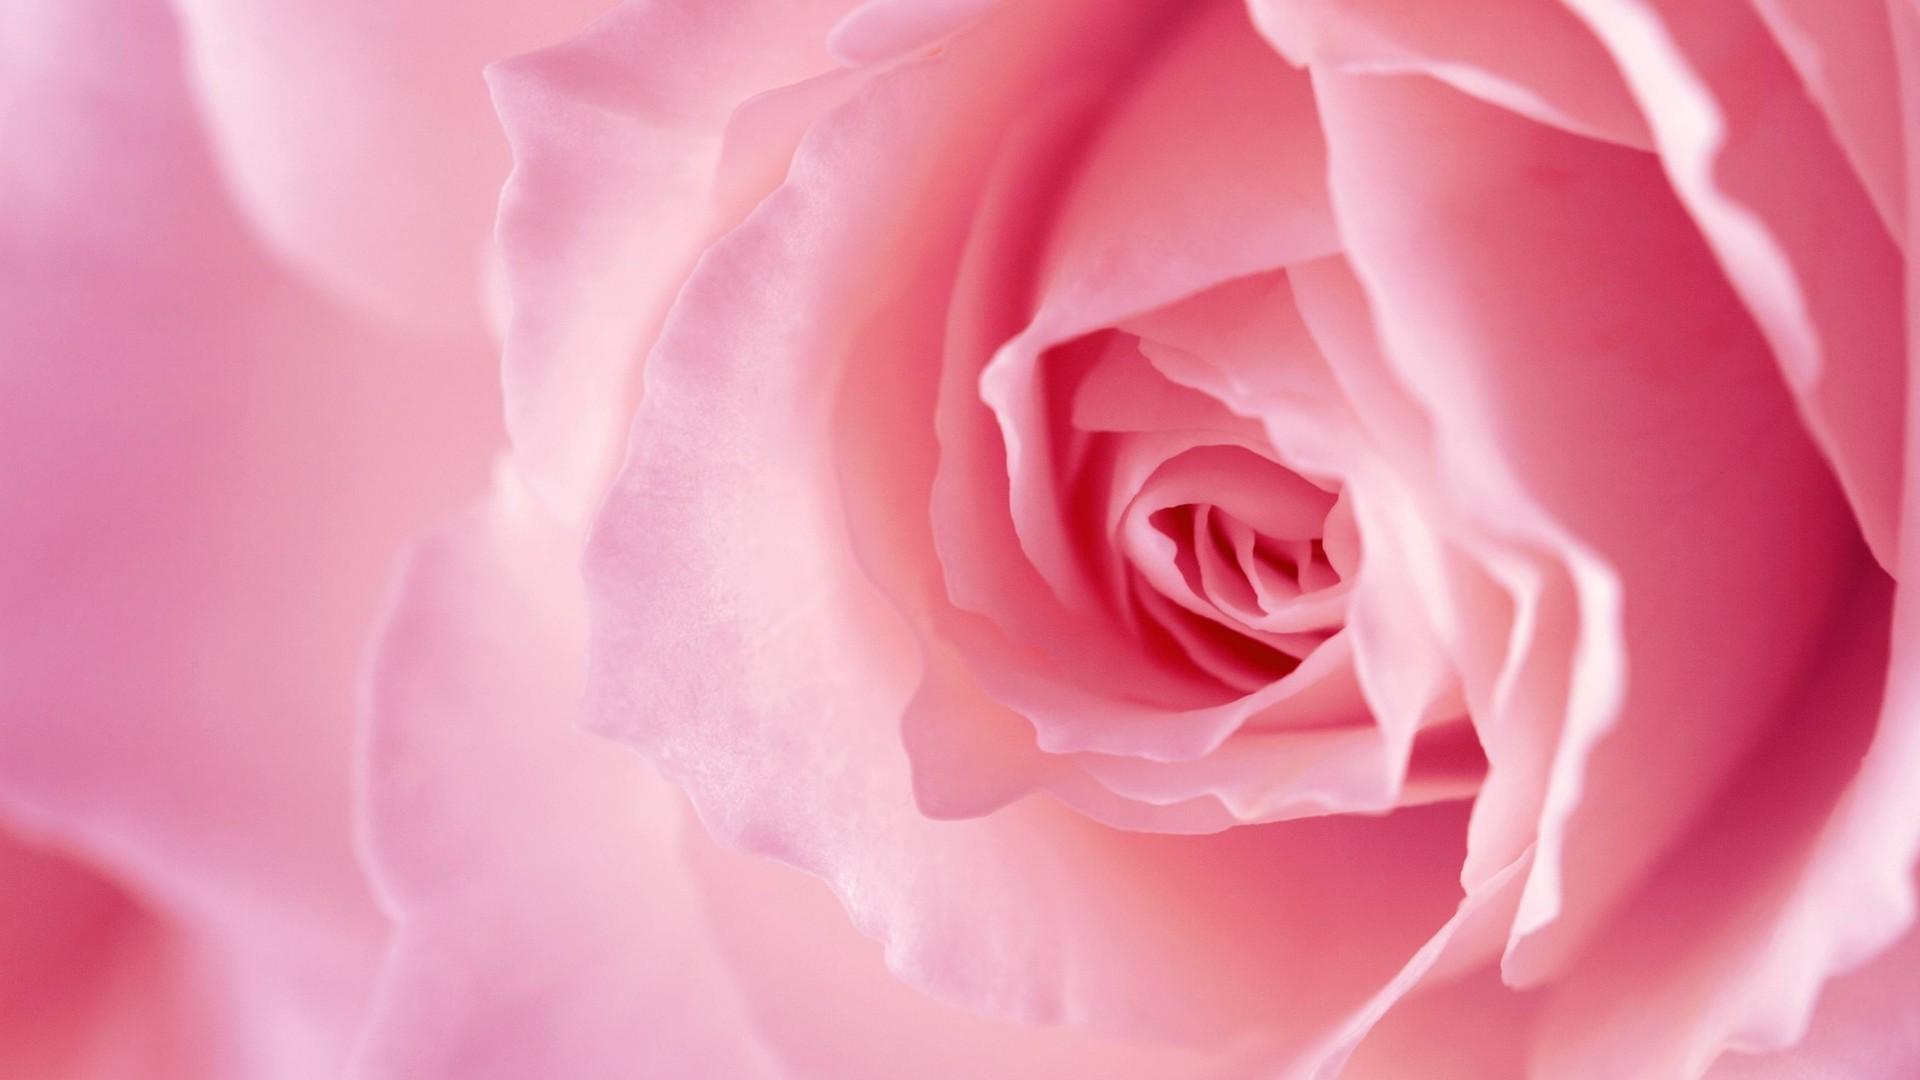 Pink Rose Download Wallpaper